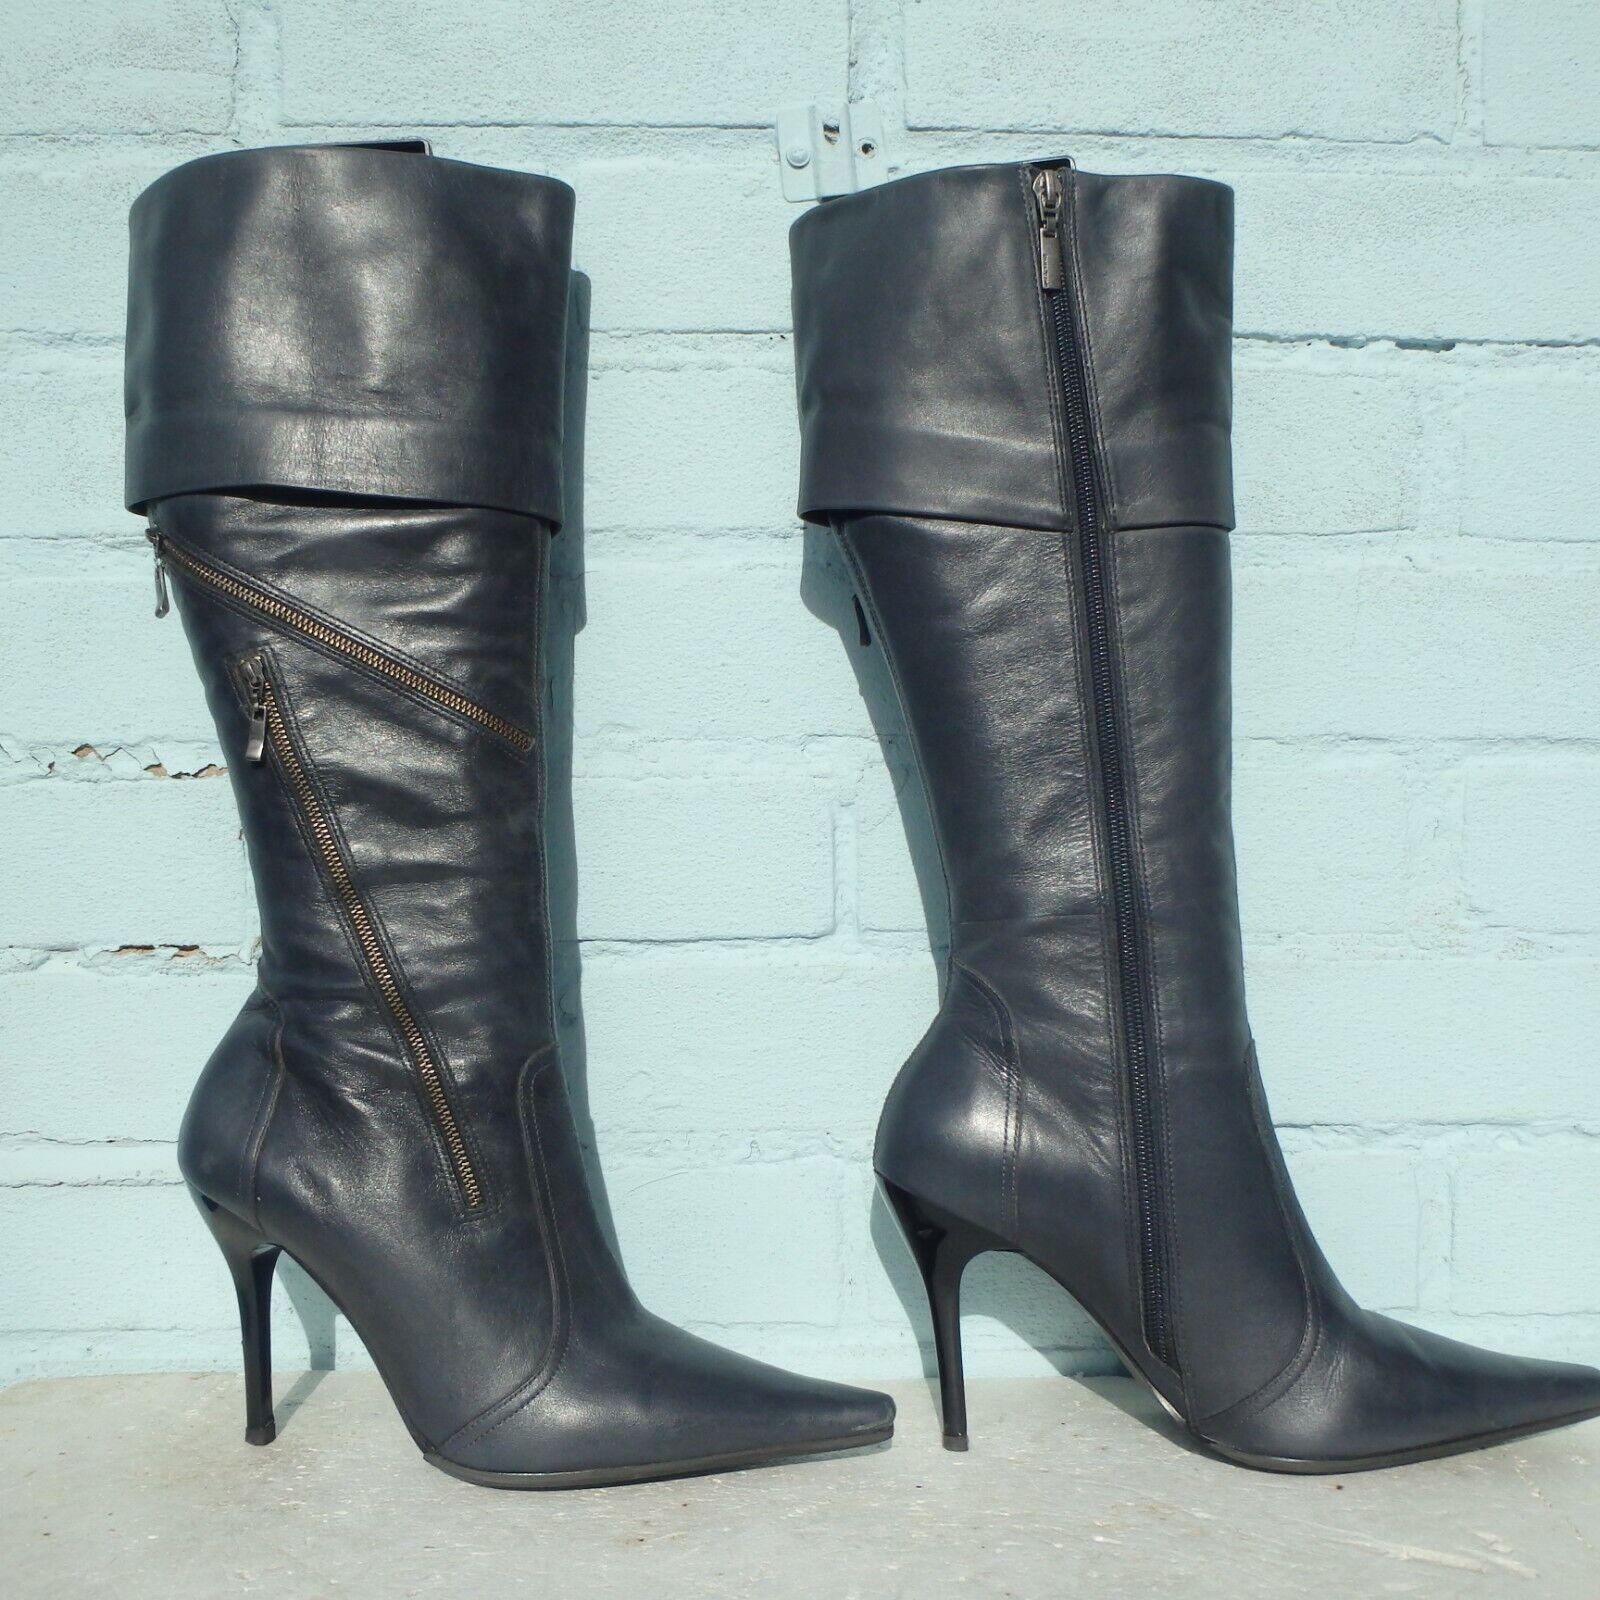 River Island Leather Stiefel Größe Uk 6 Eur 39 Sexy damen Stiletto grau Pirate